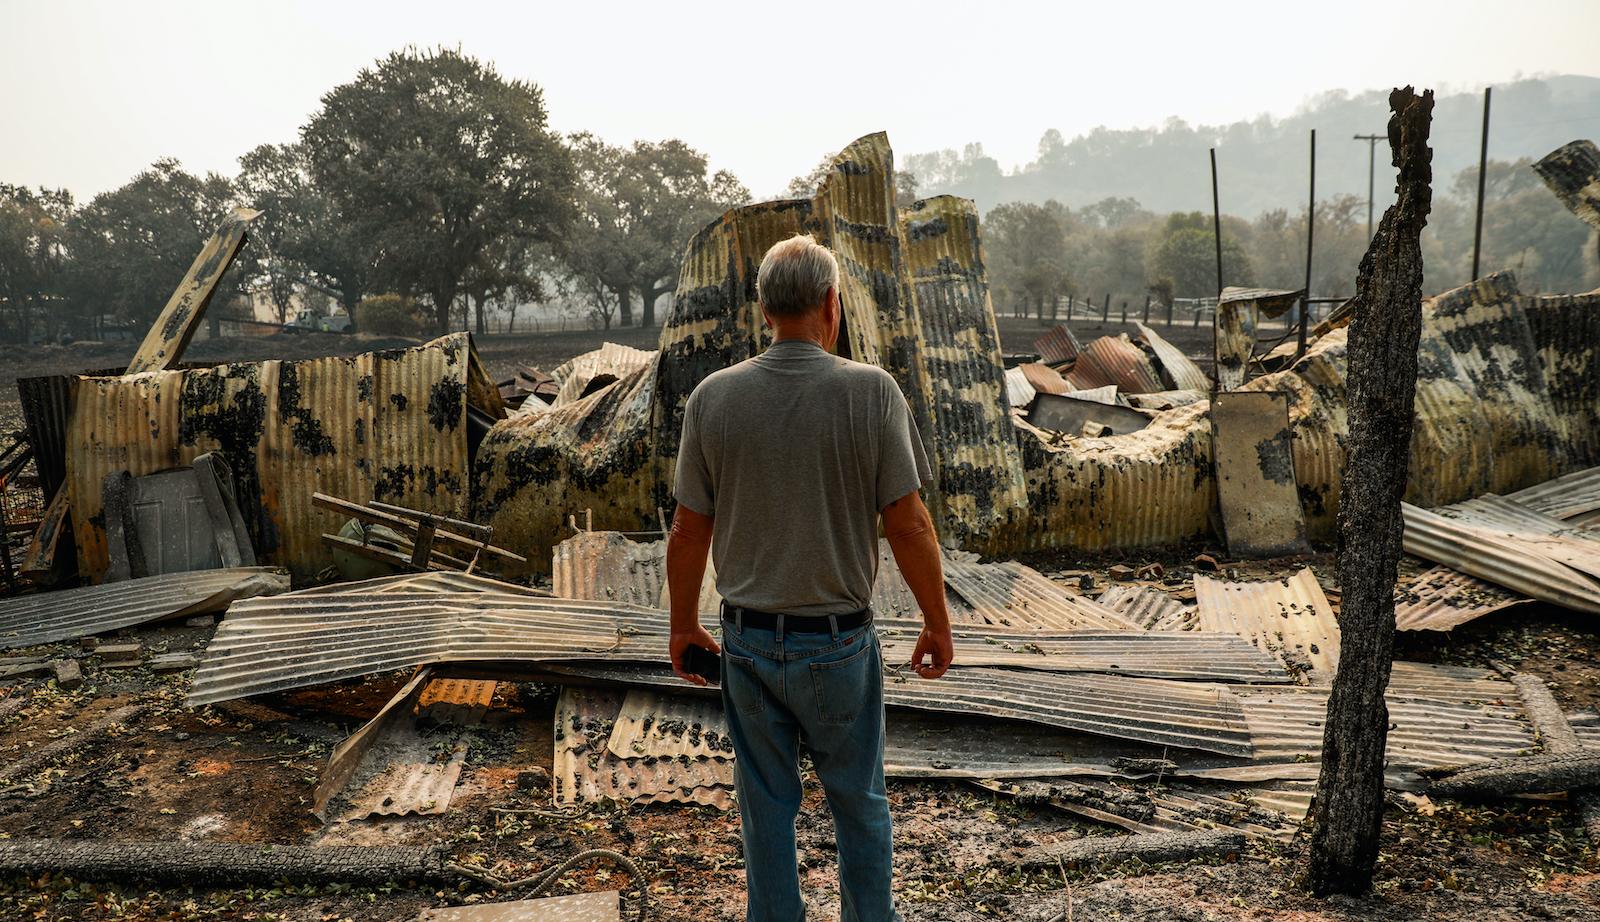 A man surveys the damage done